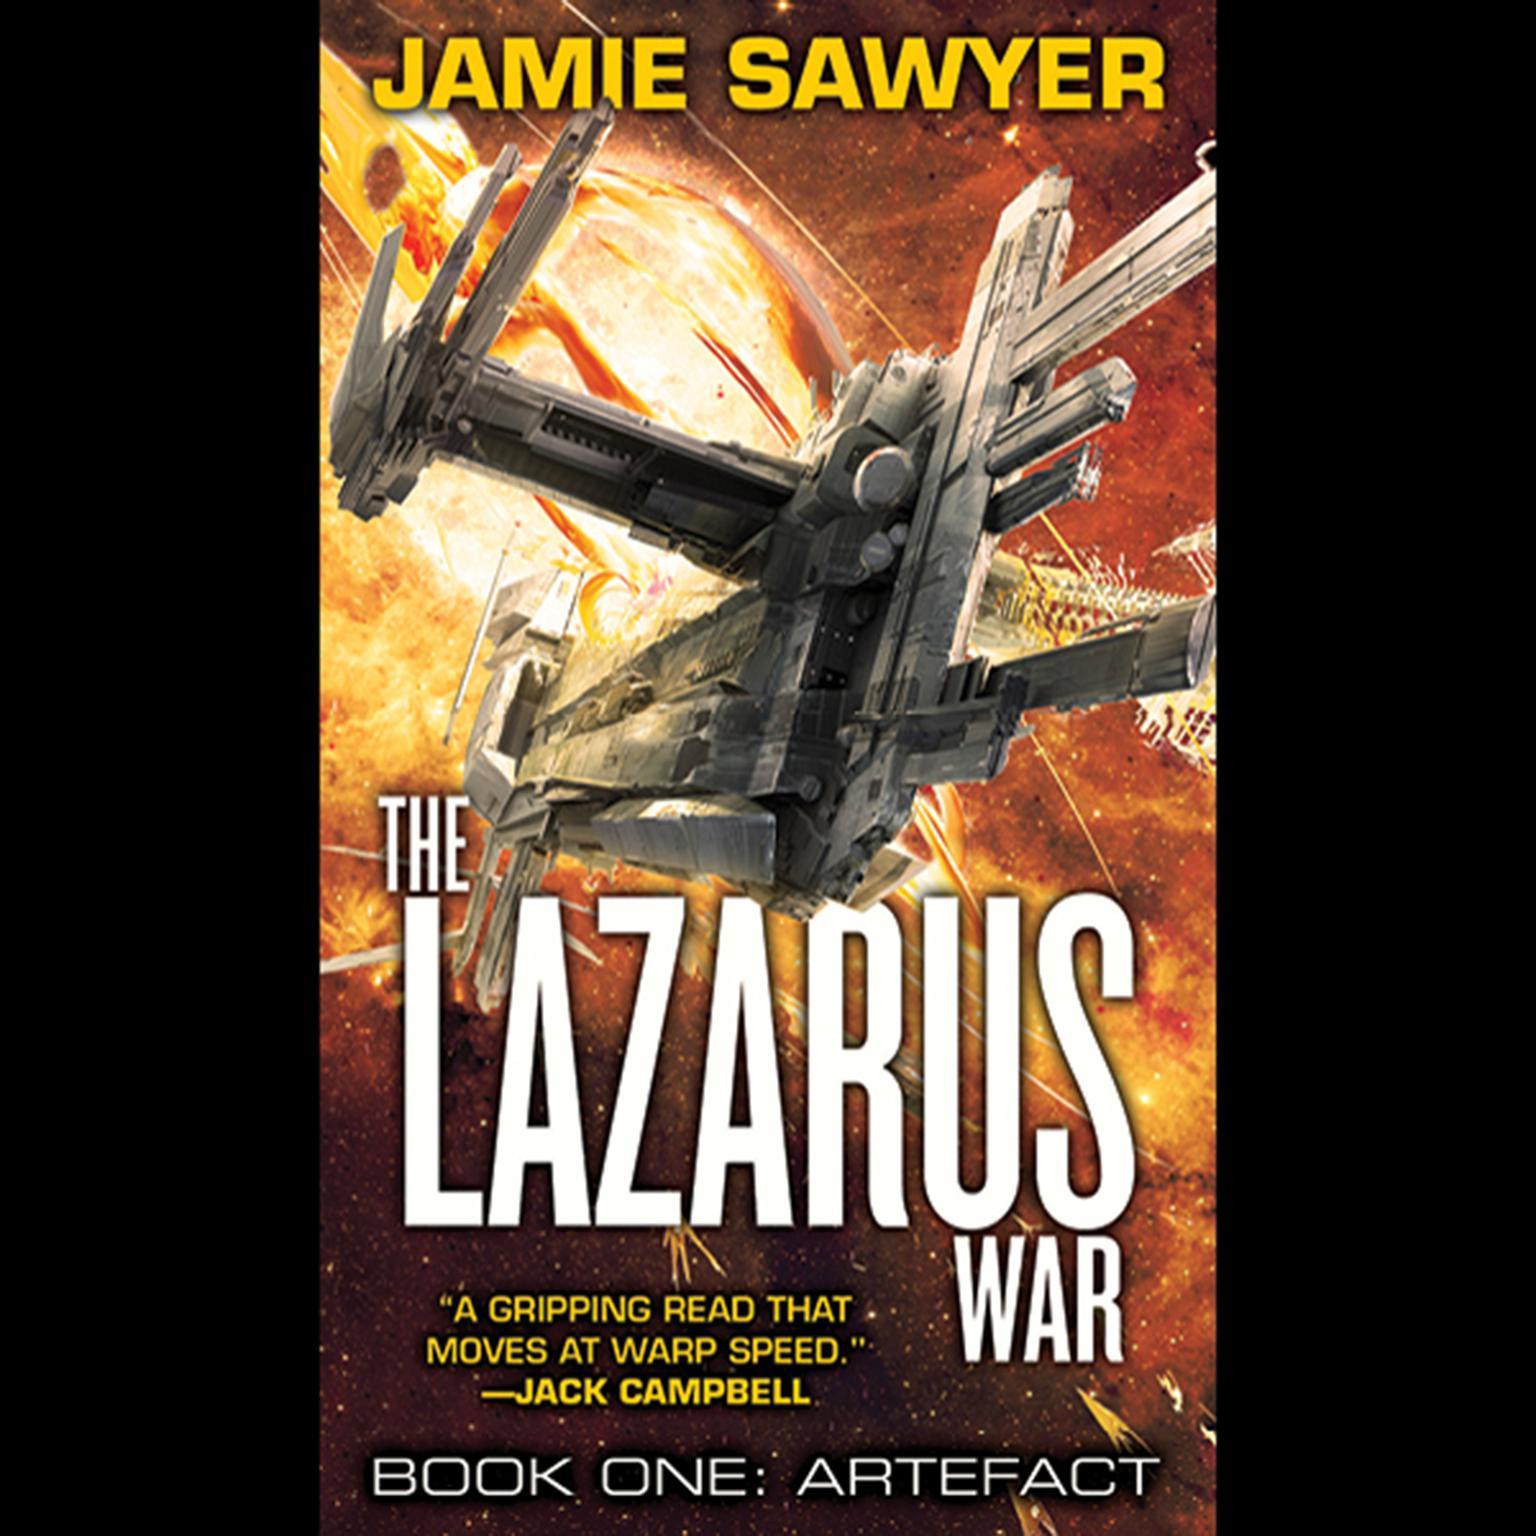 The Lazarus War: Artefact Audiobook, by Jamie Sawyer